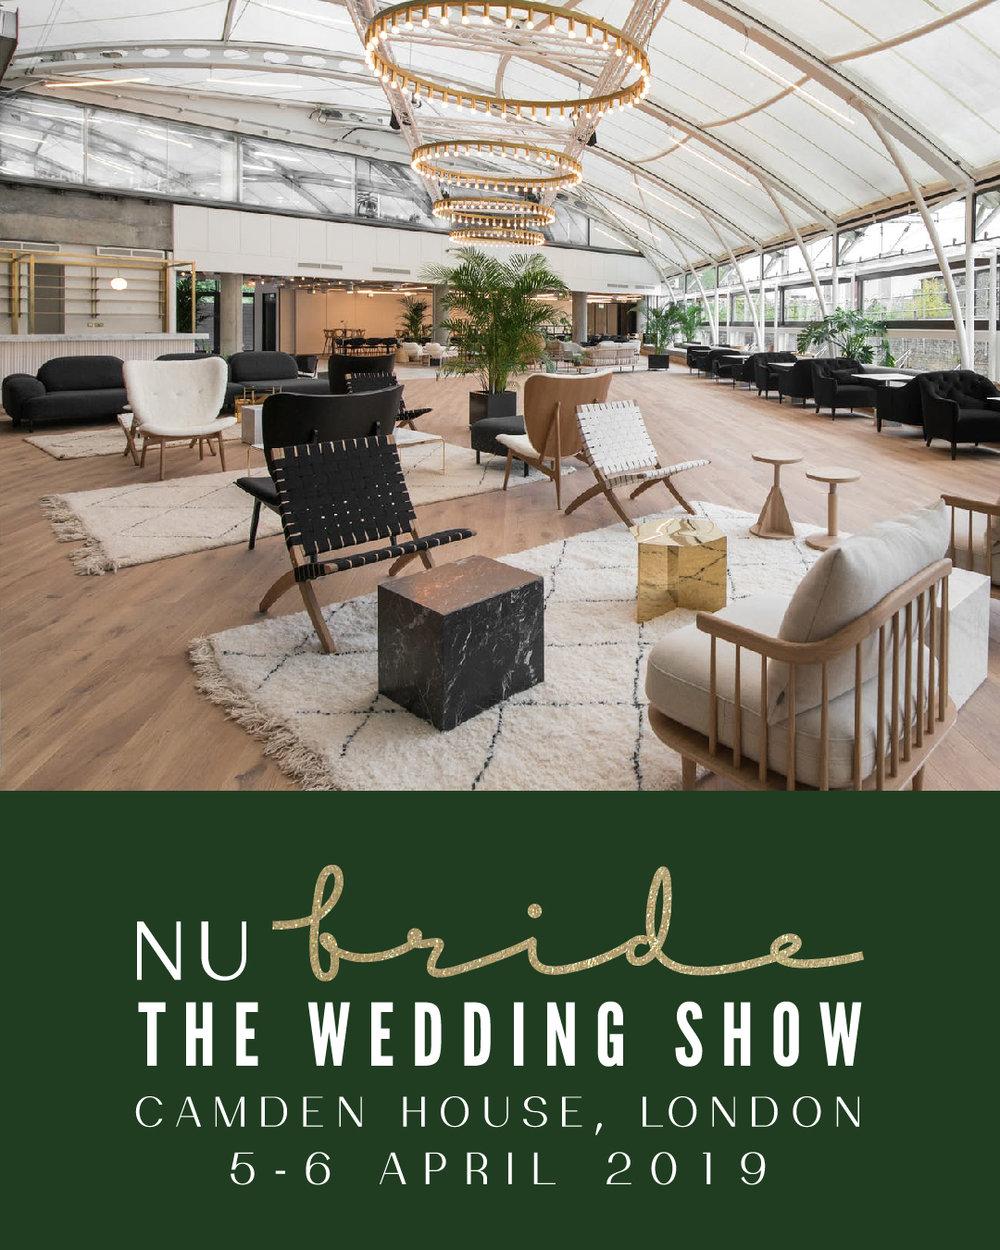 nu bride the wedding show camden house london 5-6 april 2019